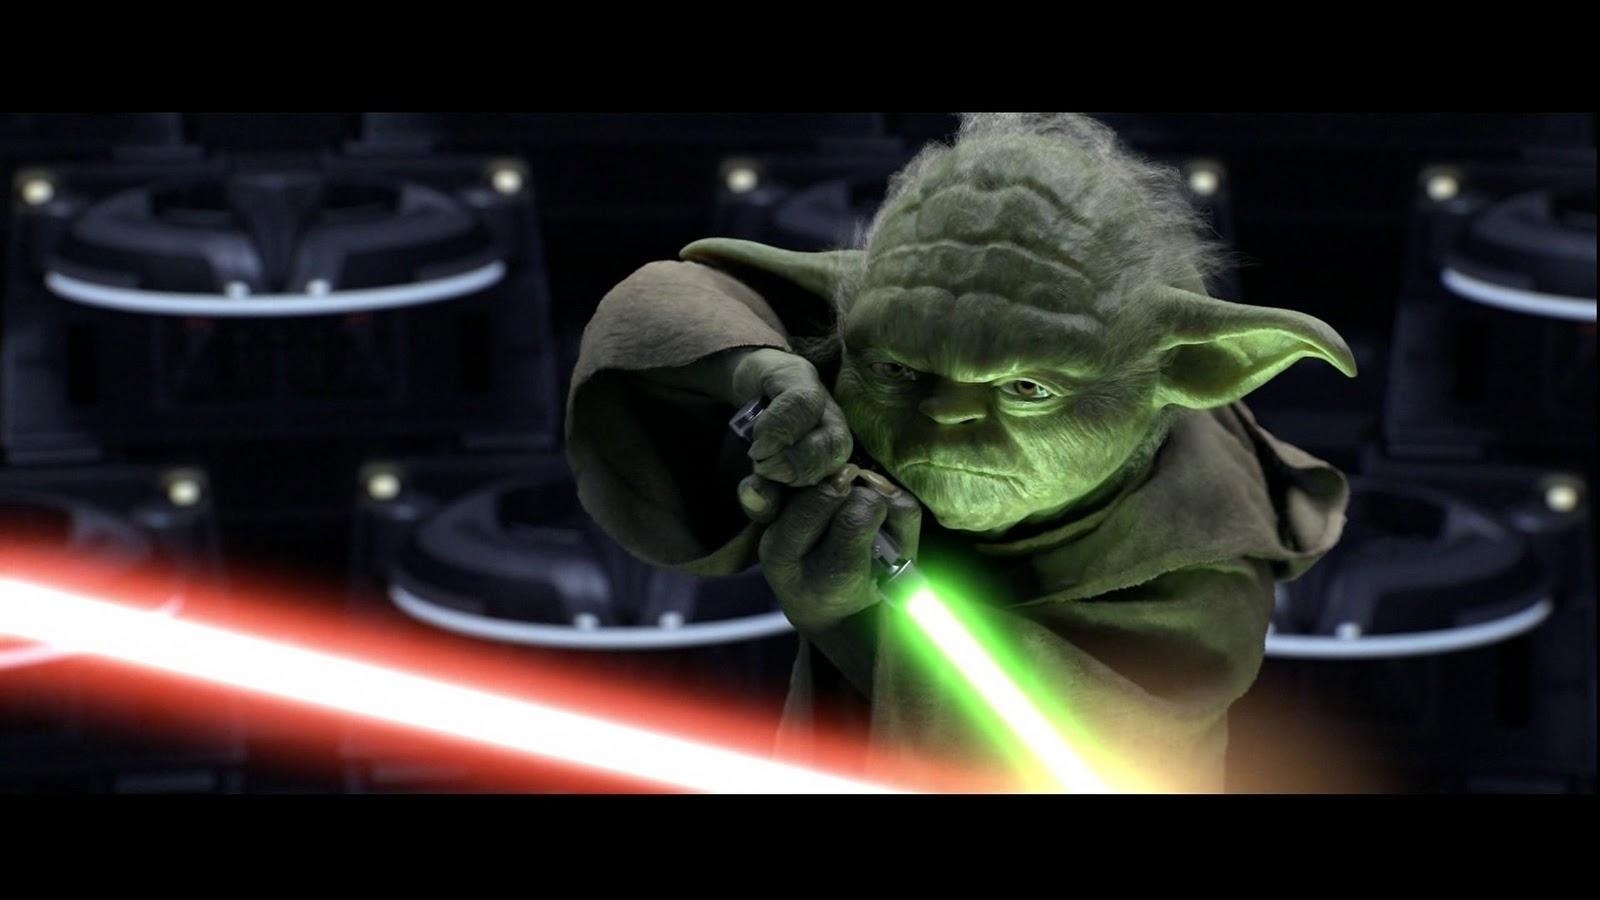 Star Wars Wallpaper Picture Seen On coolpicturegalleryblogspotcom 1600x900